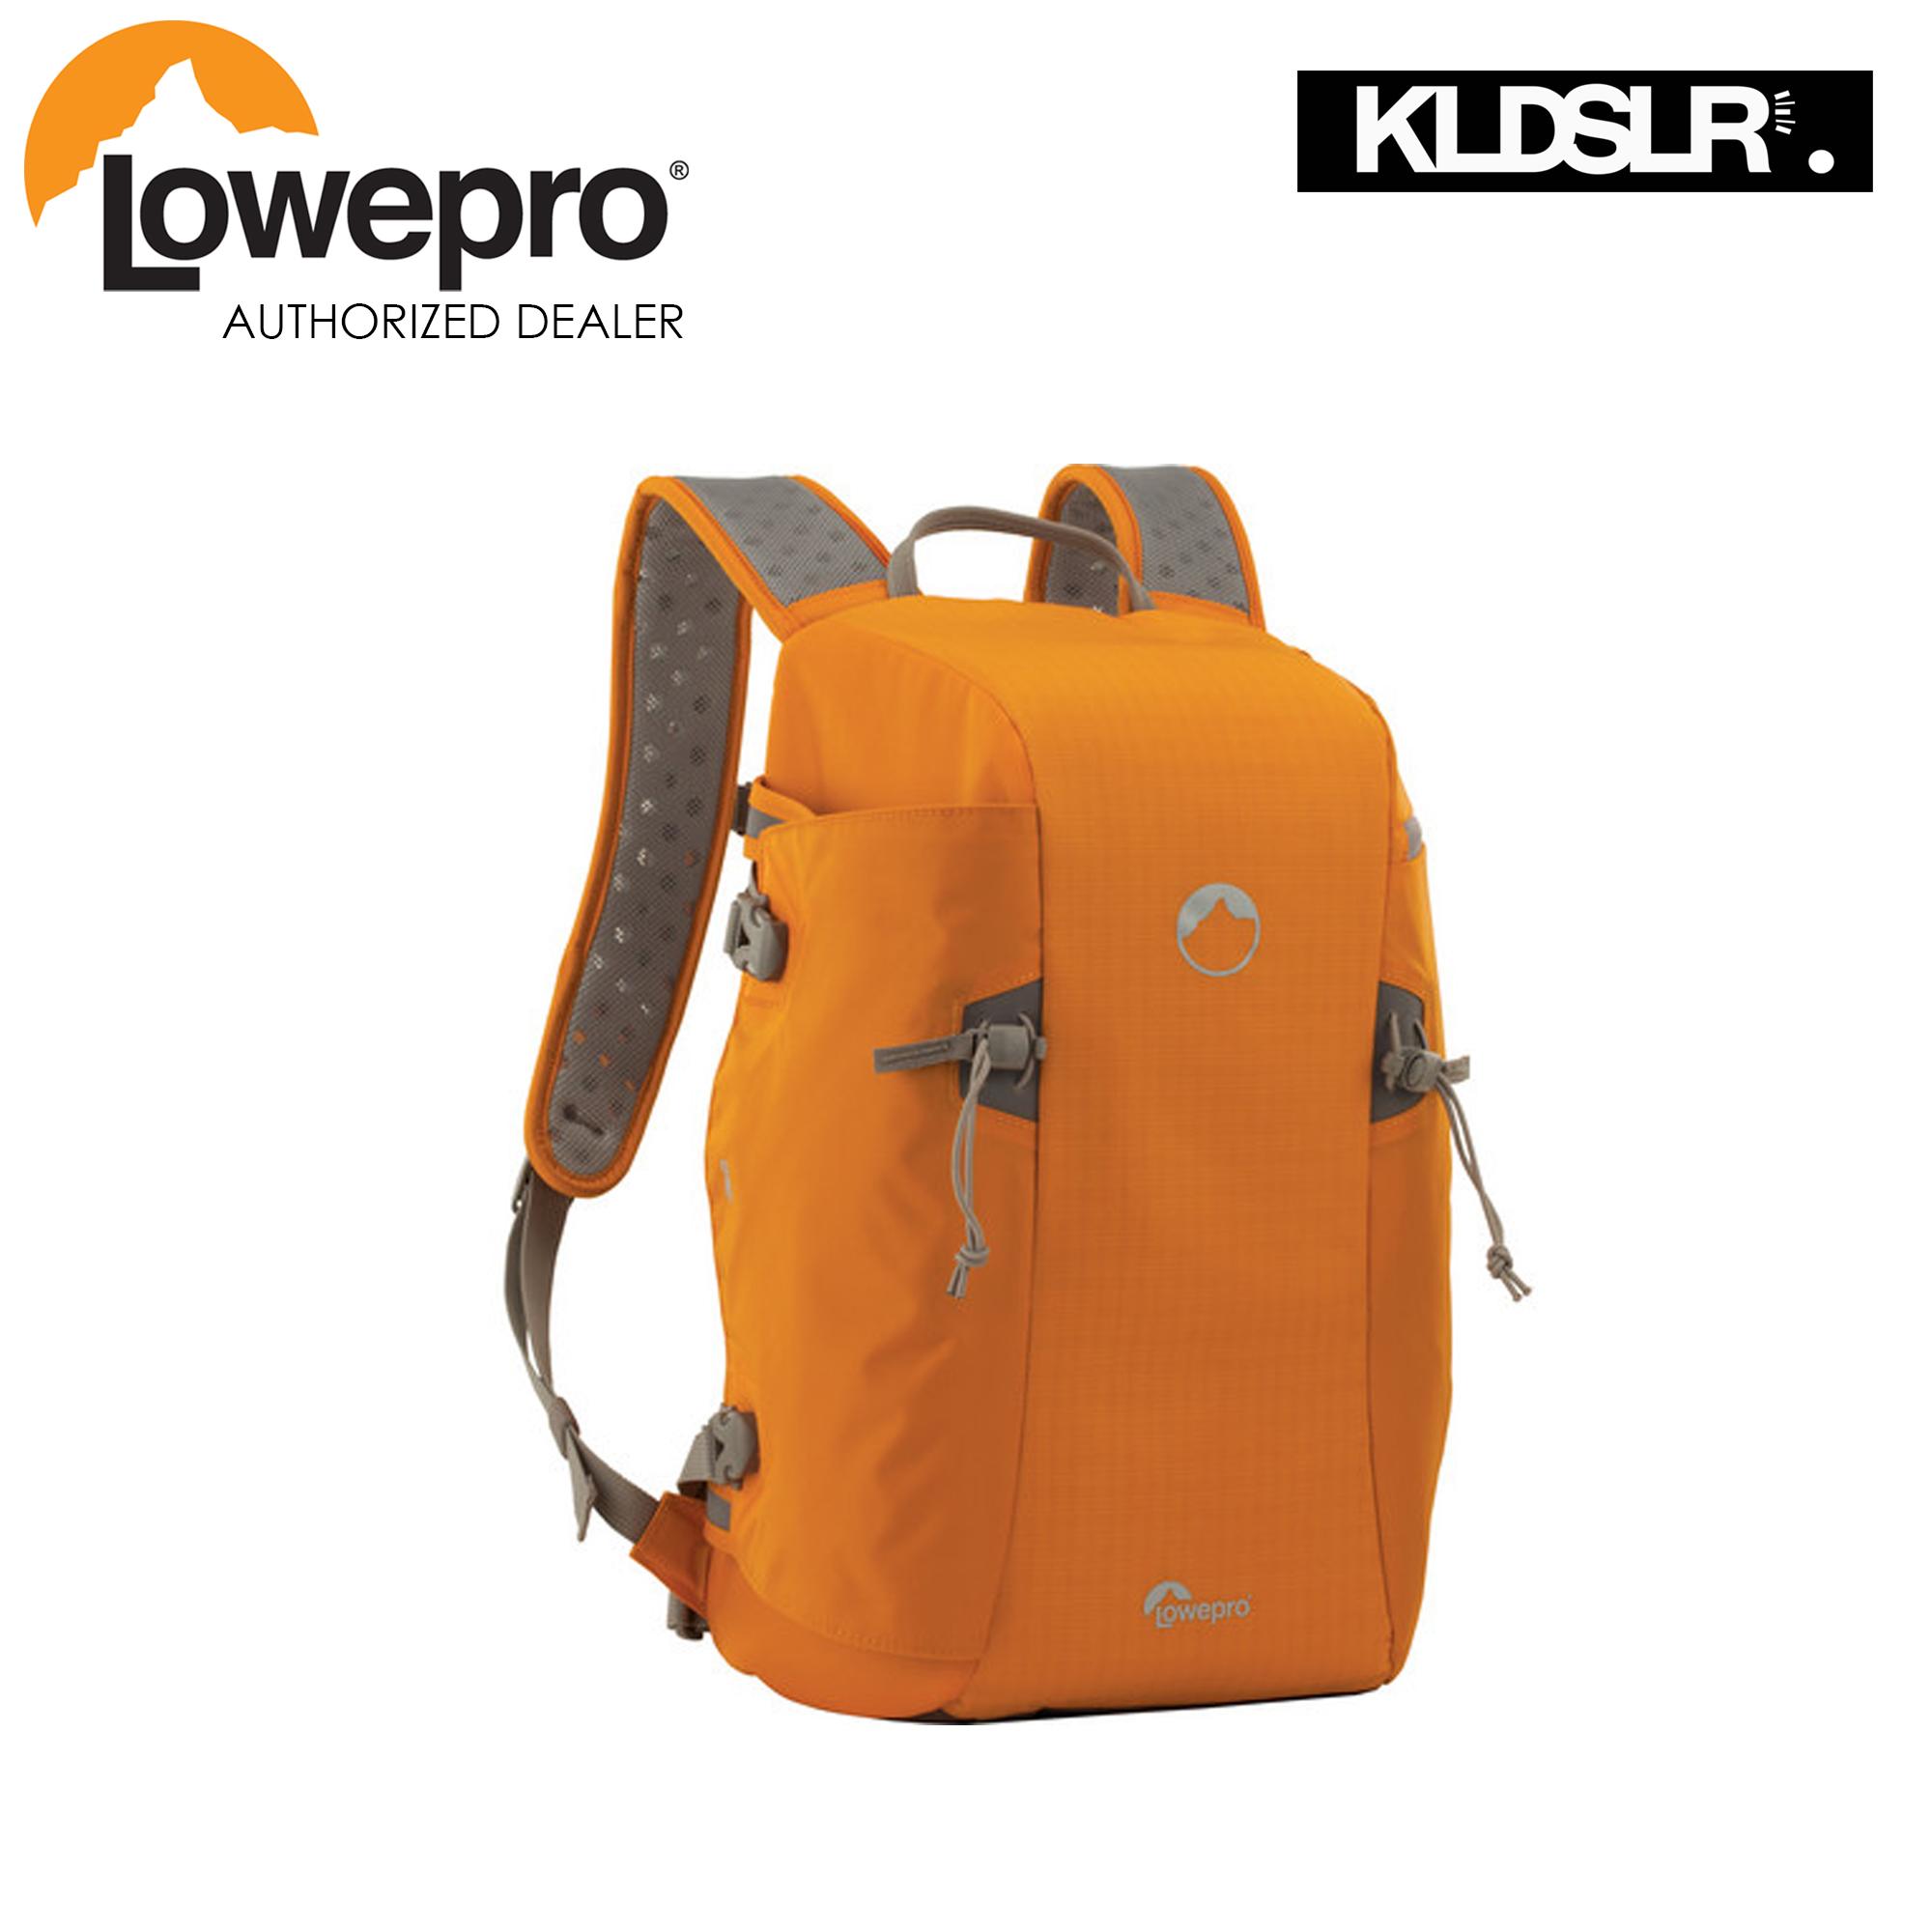 Lowepro Flipside Sport 15l Aw Daypack Orange Light Gray Toploader Zoom 55 Ii Black